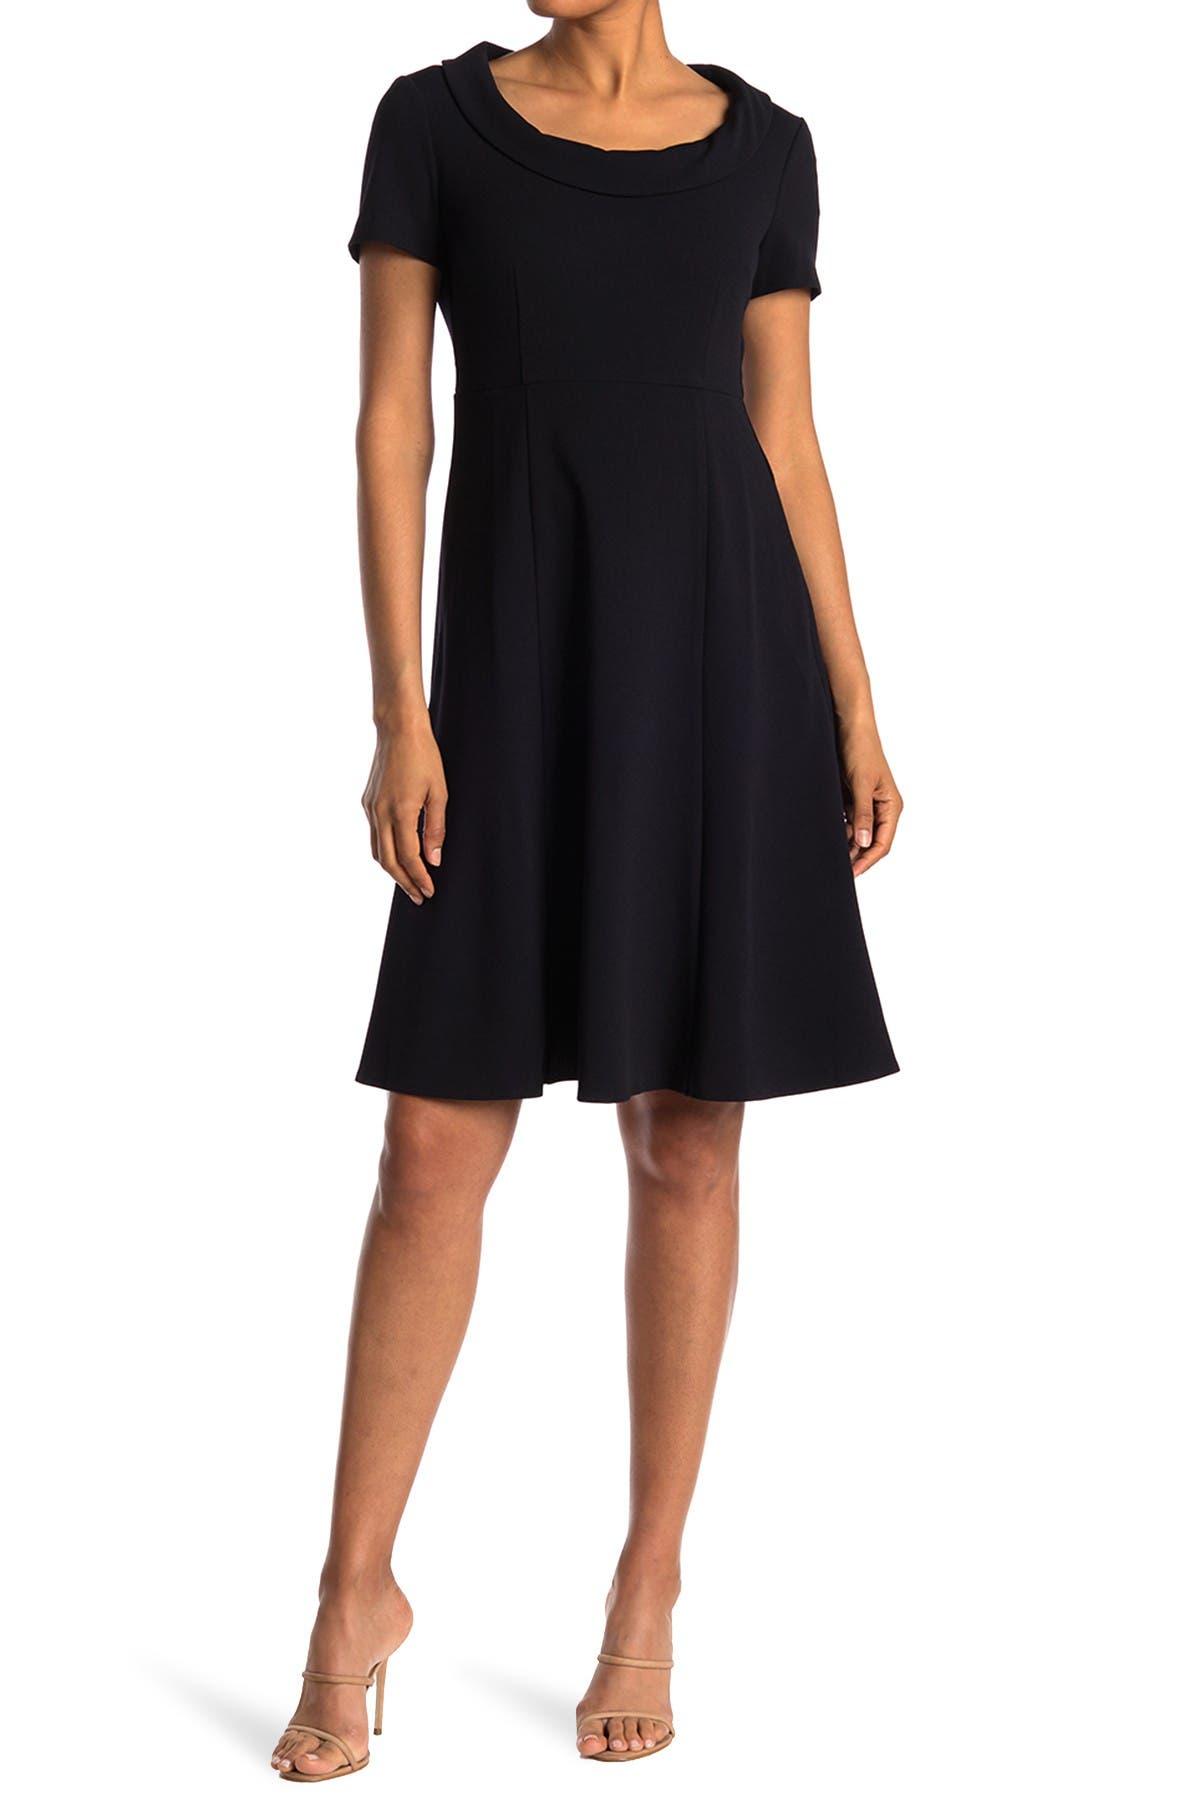 Image of Donna Morgan Short Sleeve Stretch Crepe Dress